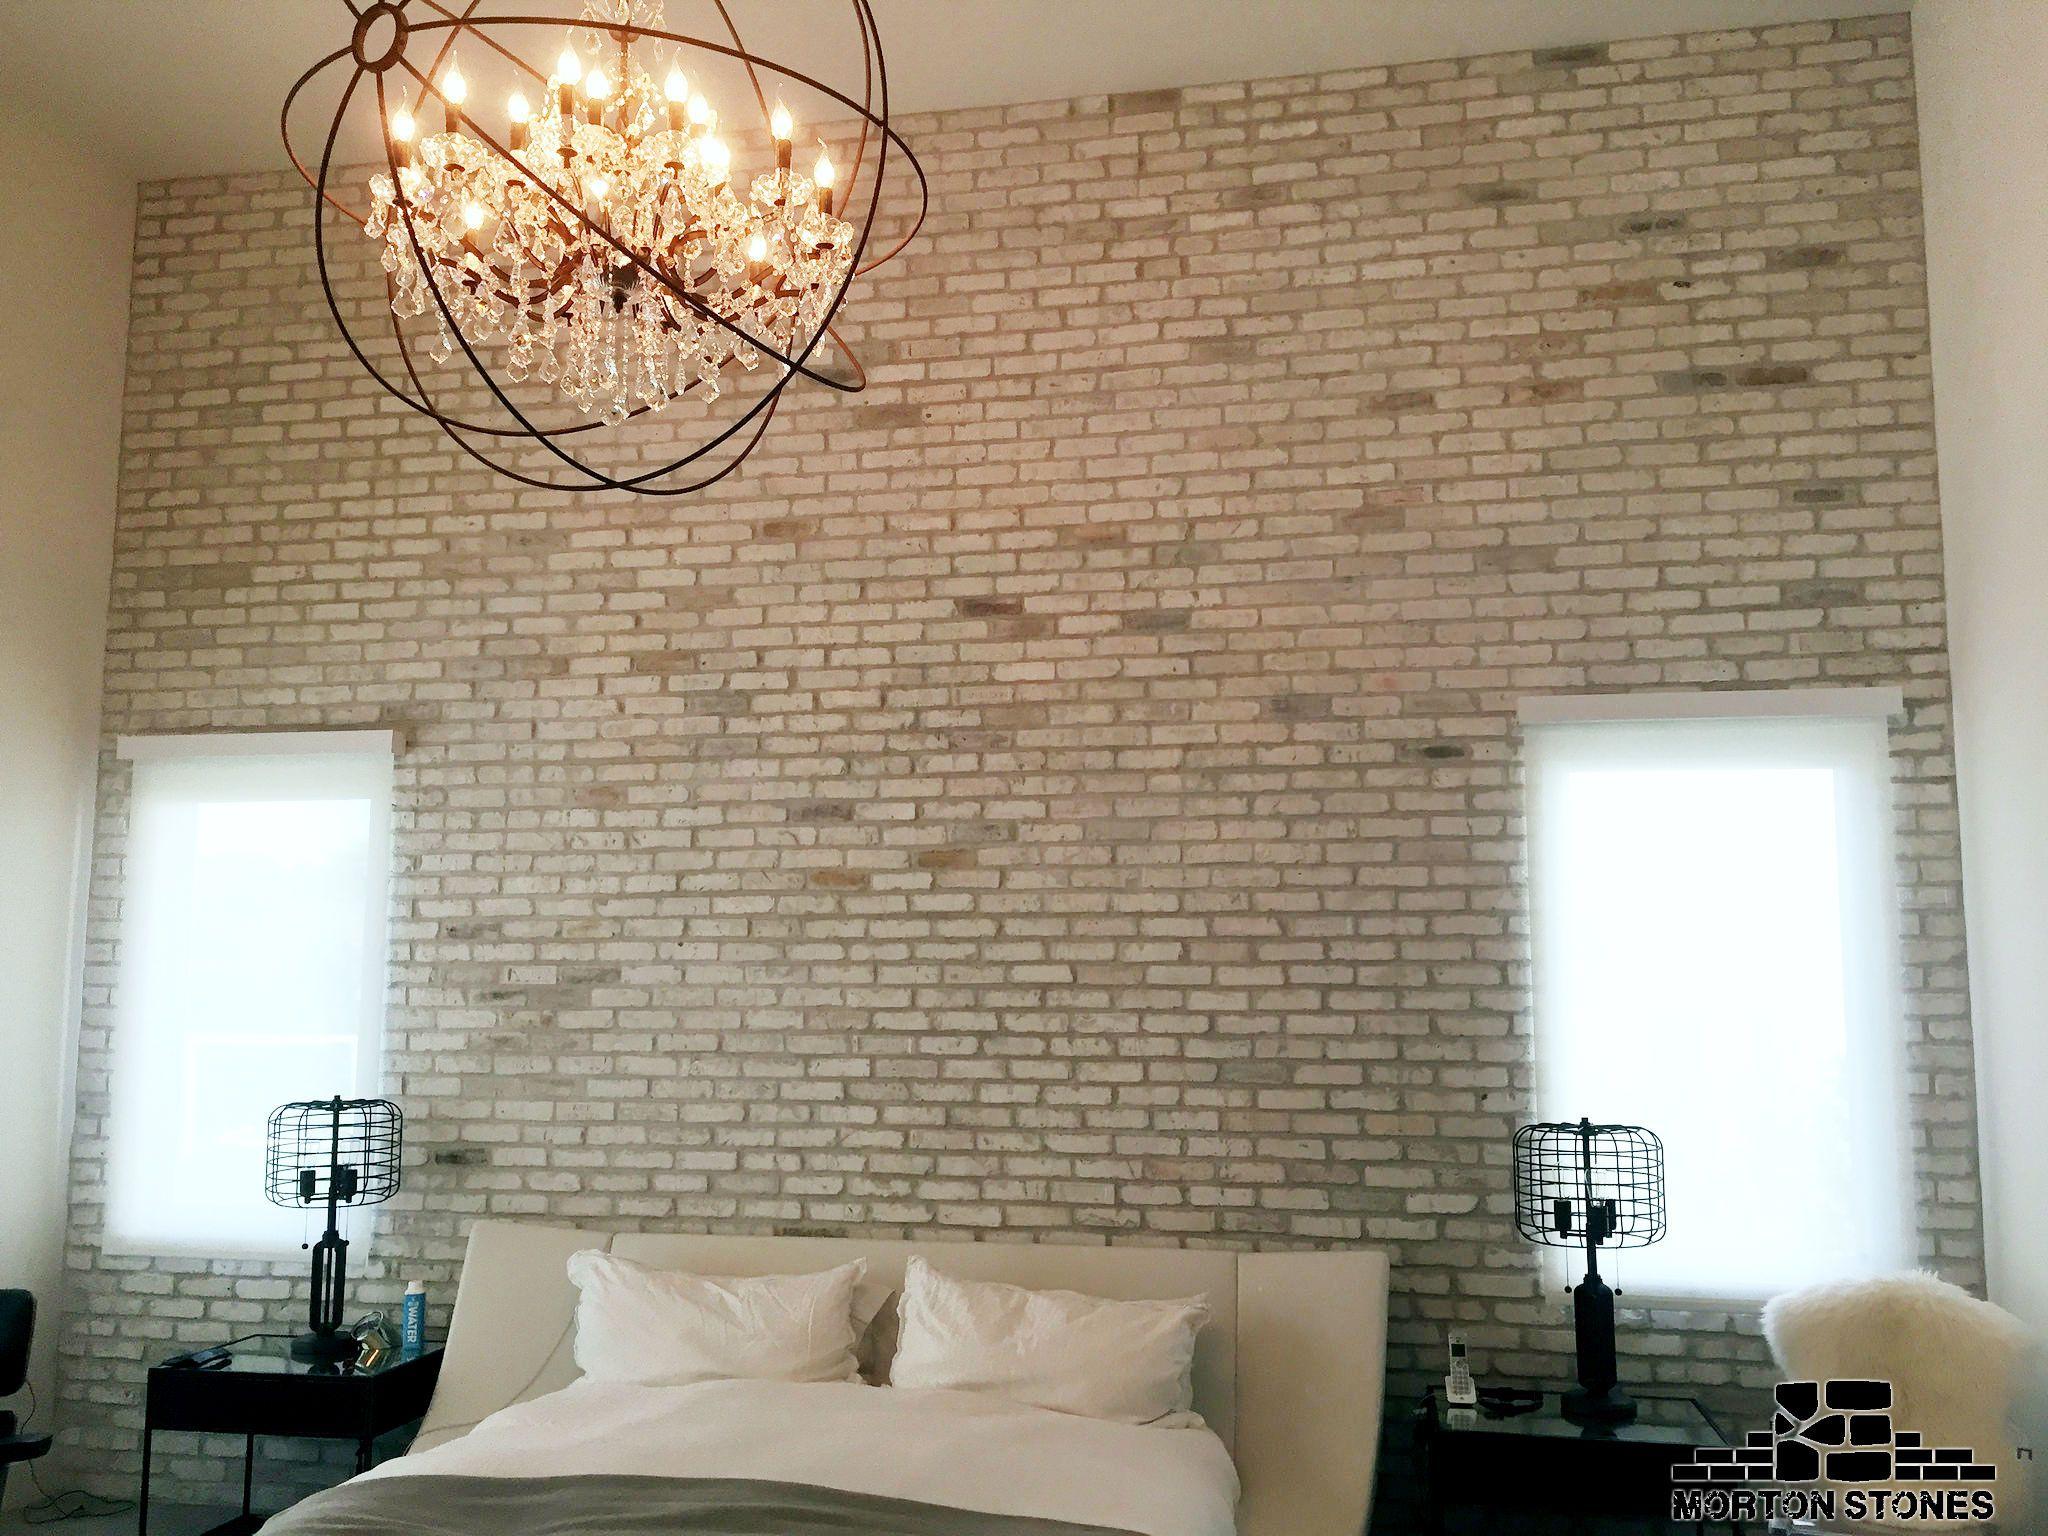 The White Brick Wall Transforms The Bedroom Into A Cozy Retreat Mortonstones Brick Tiles Rustic Home D White Brick Walls Fireplace Remodel Brick Veneer